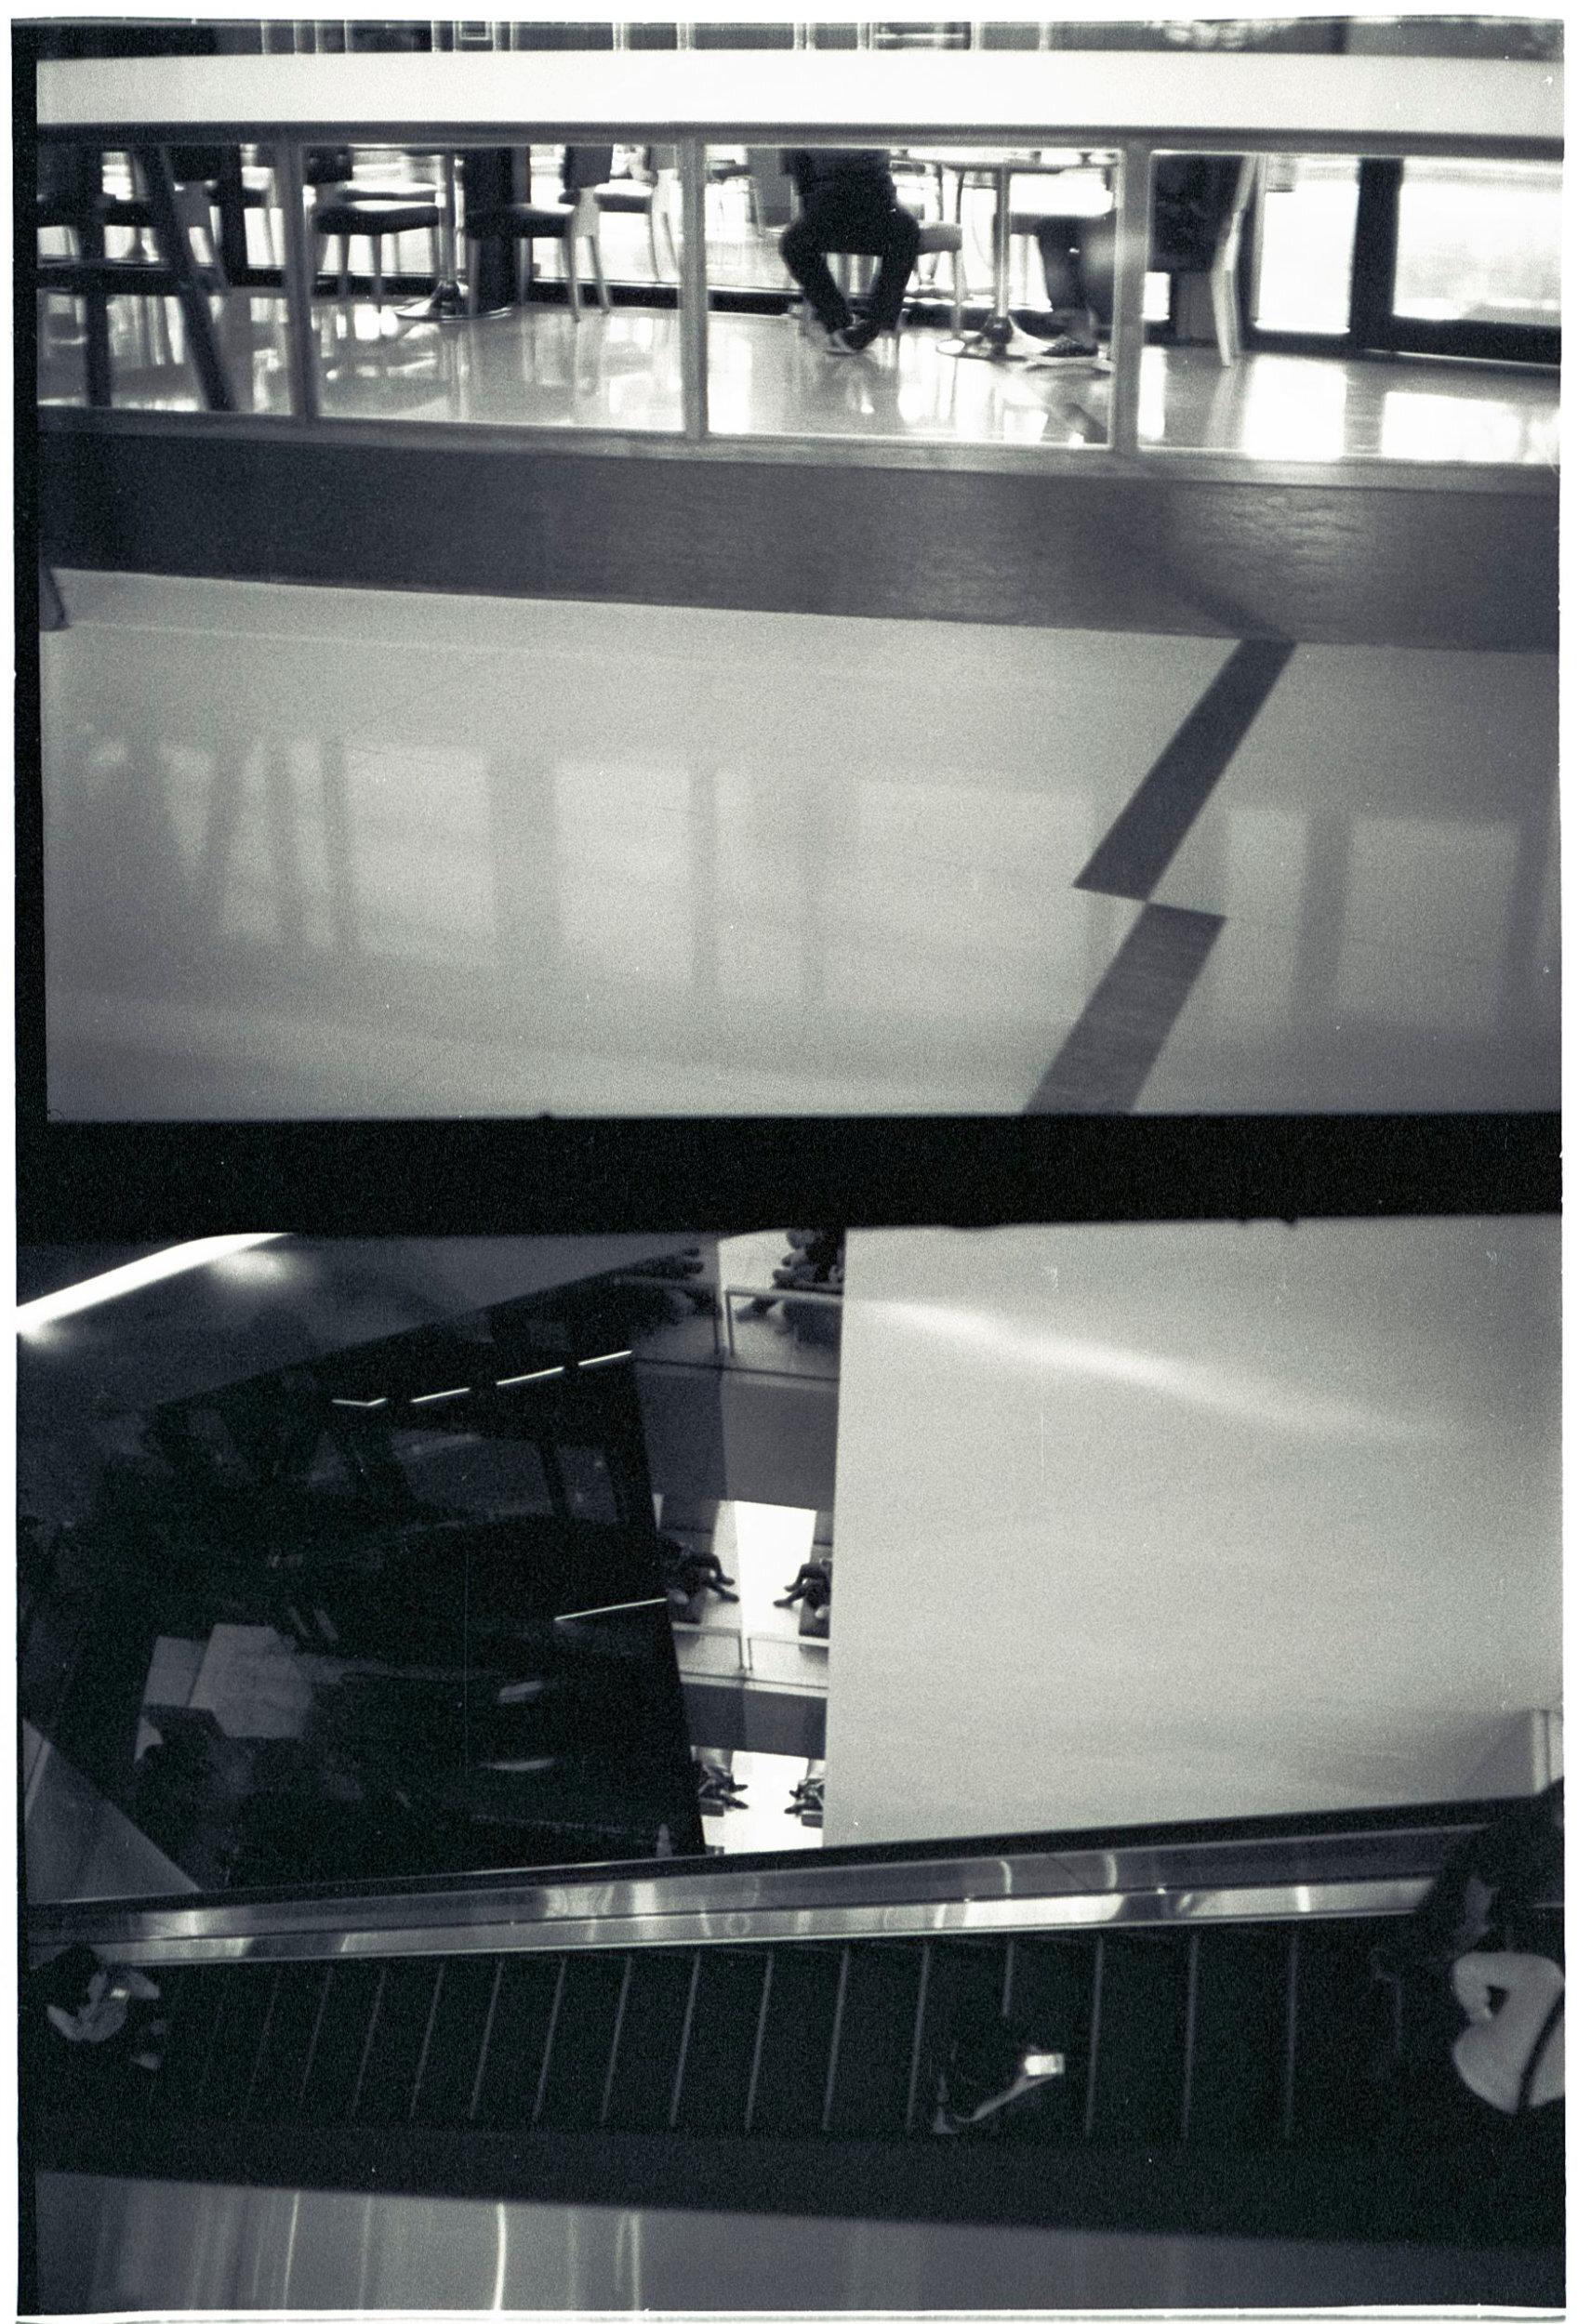 single-escalator.jpg